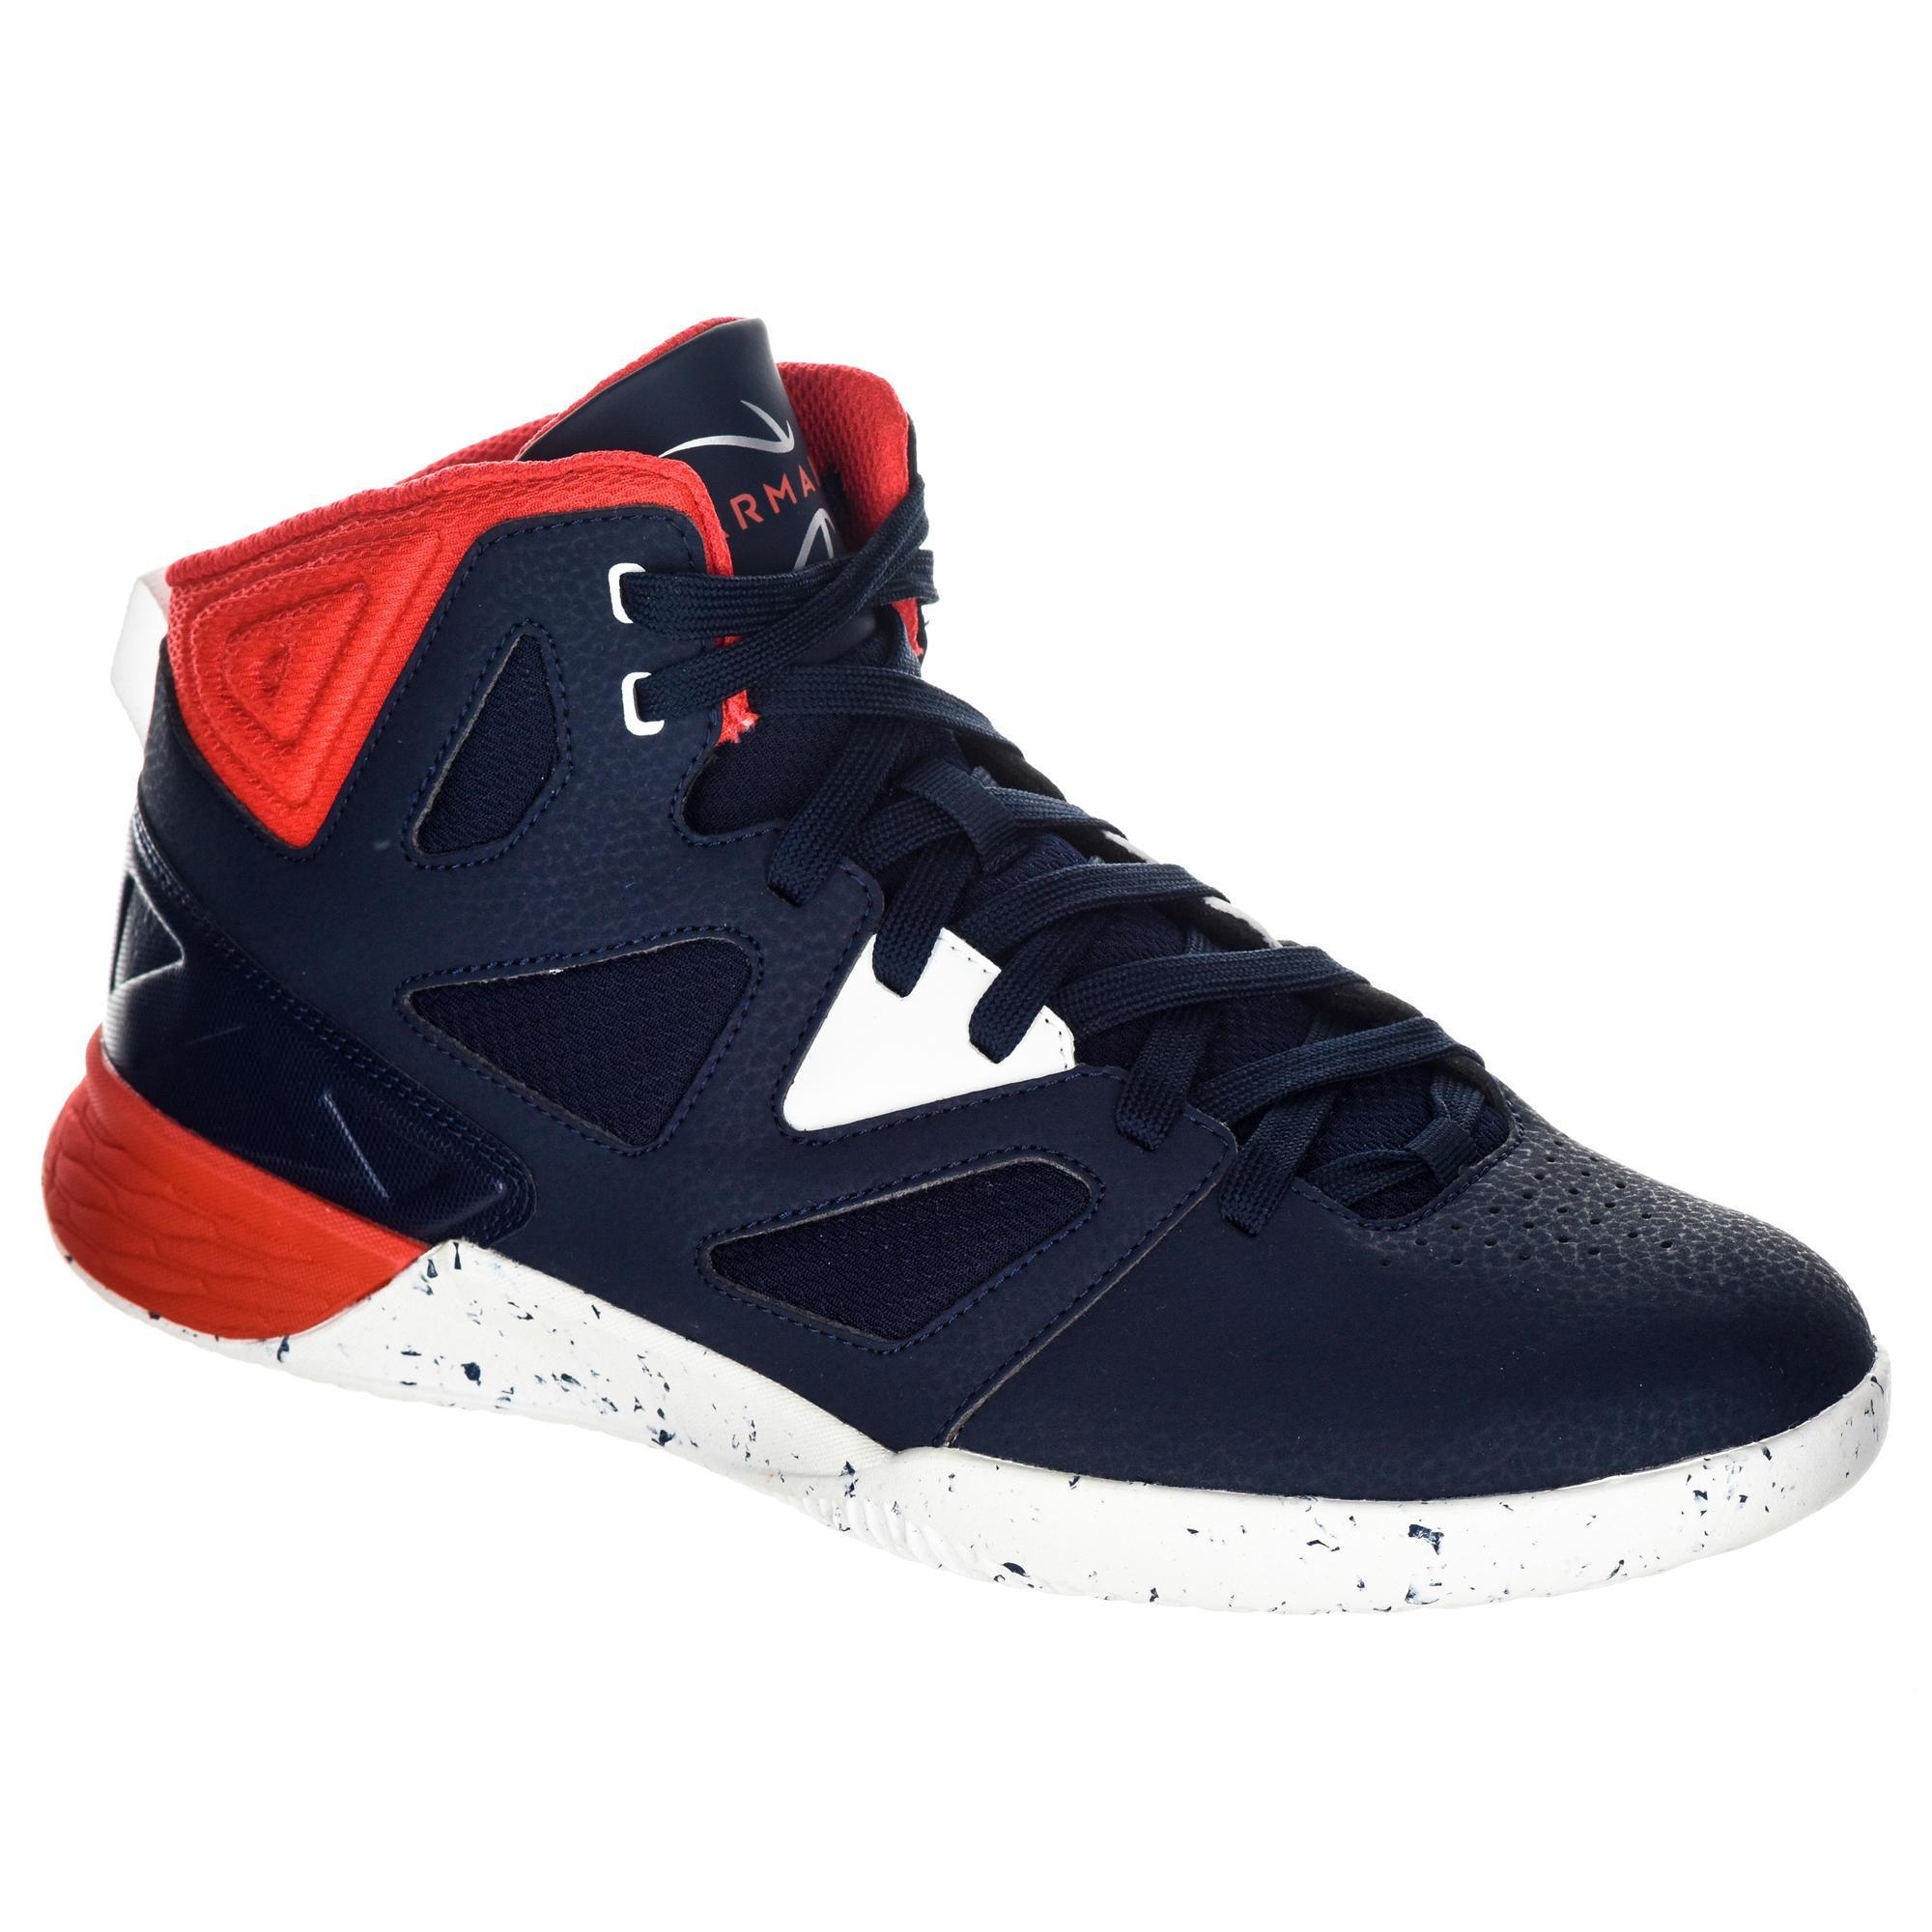 Tarmak Basketbalschoenen Shield 300 blauw/wit/rood